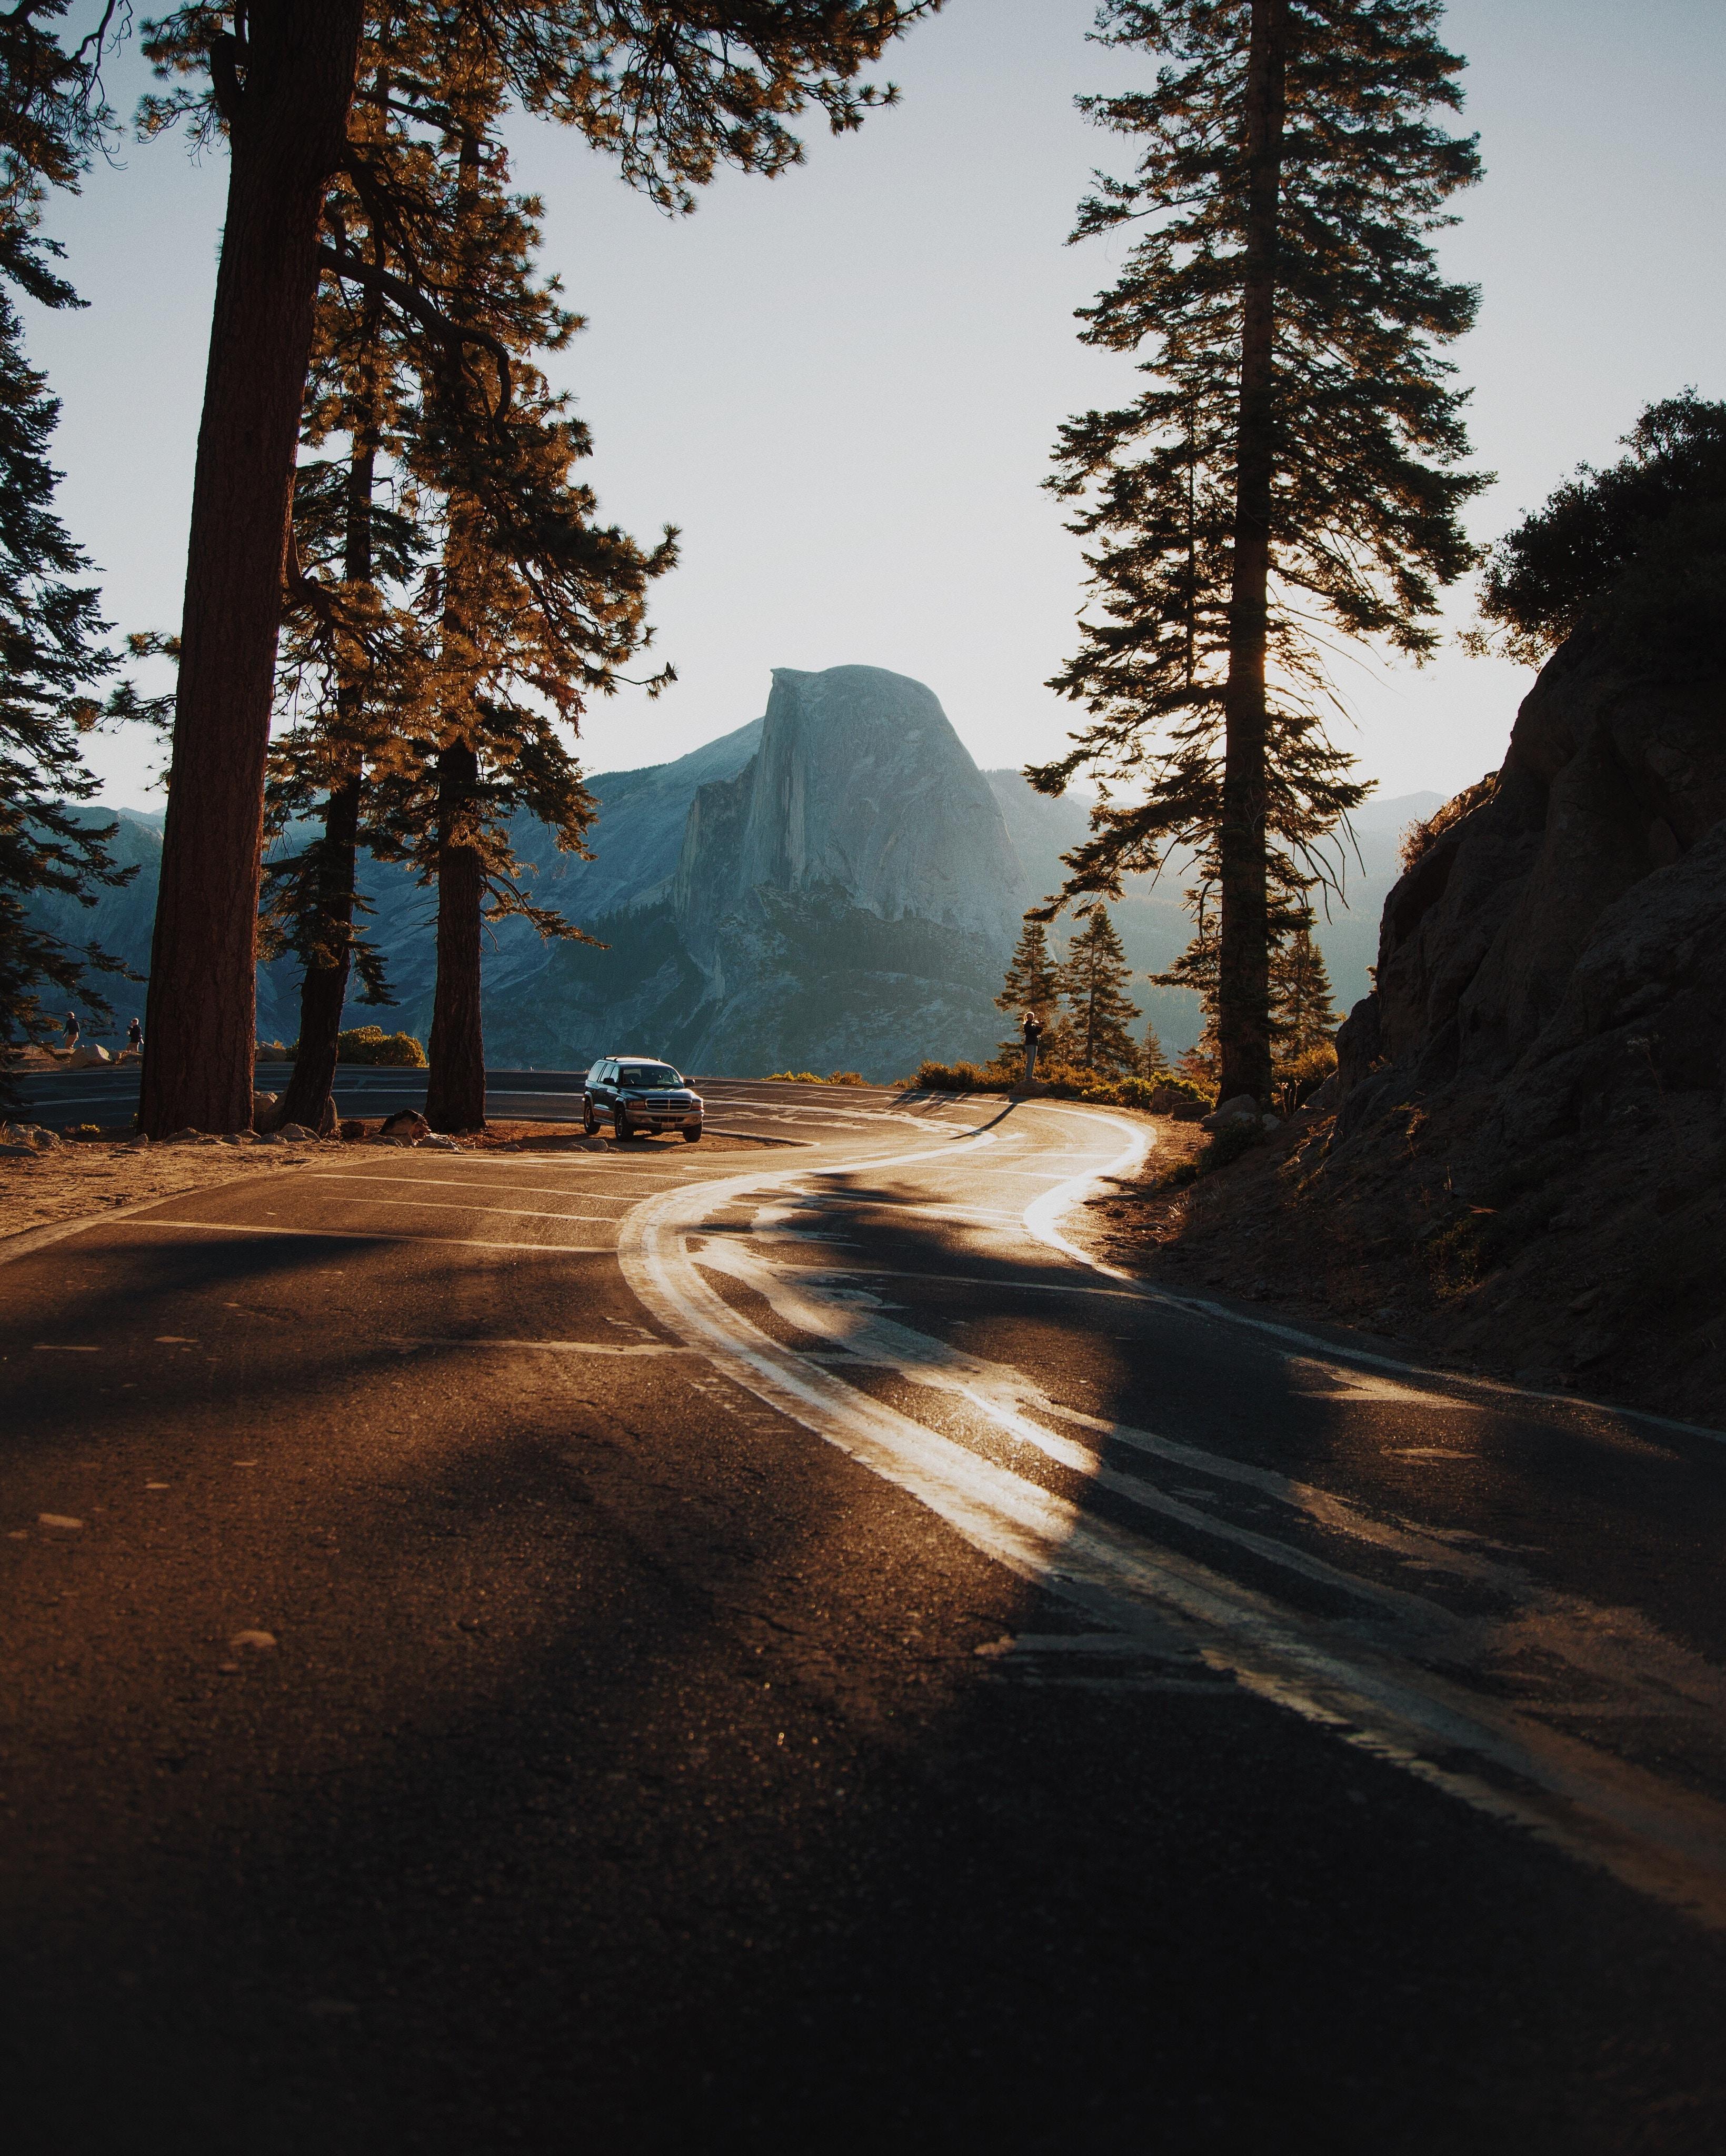 Driving through California during golden hour